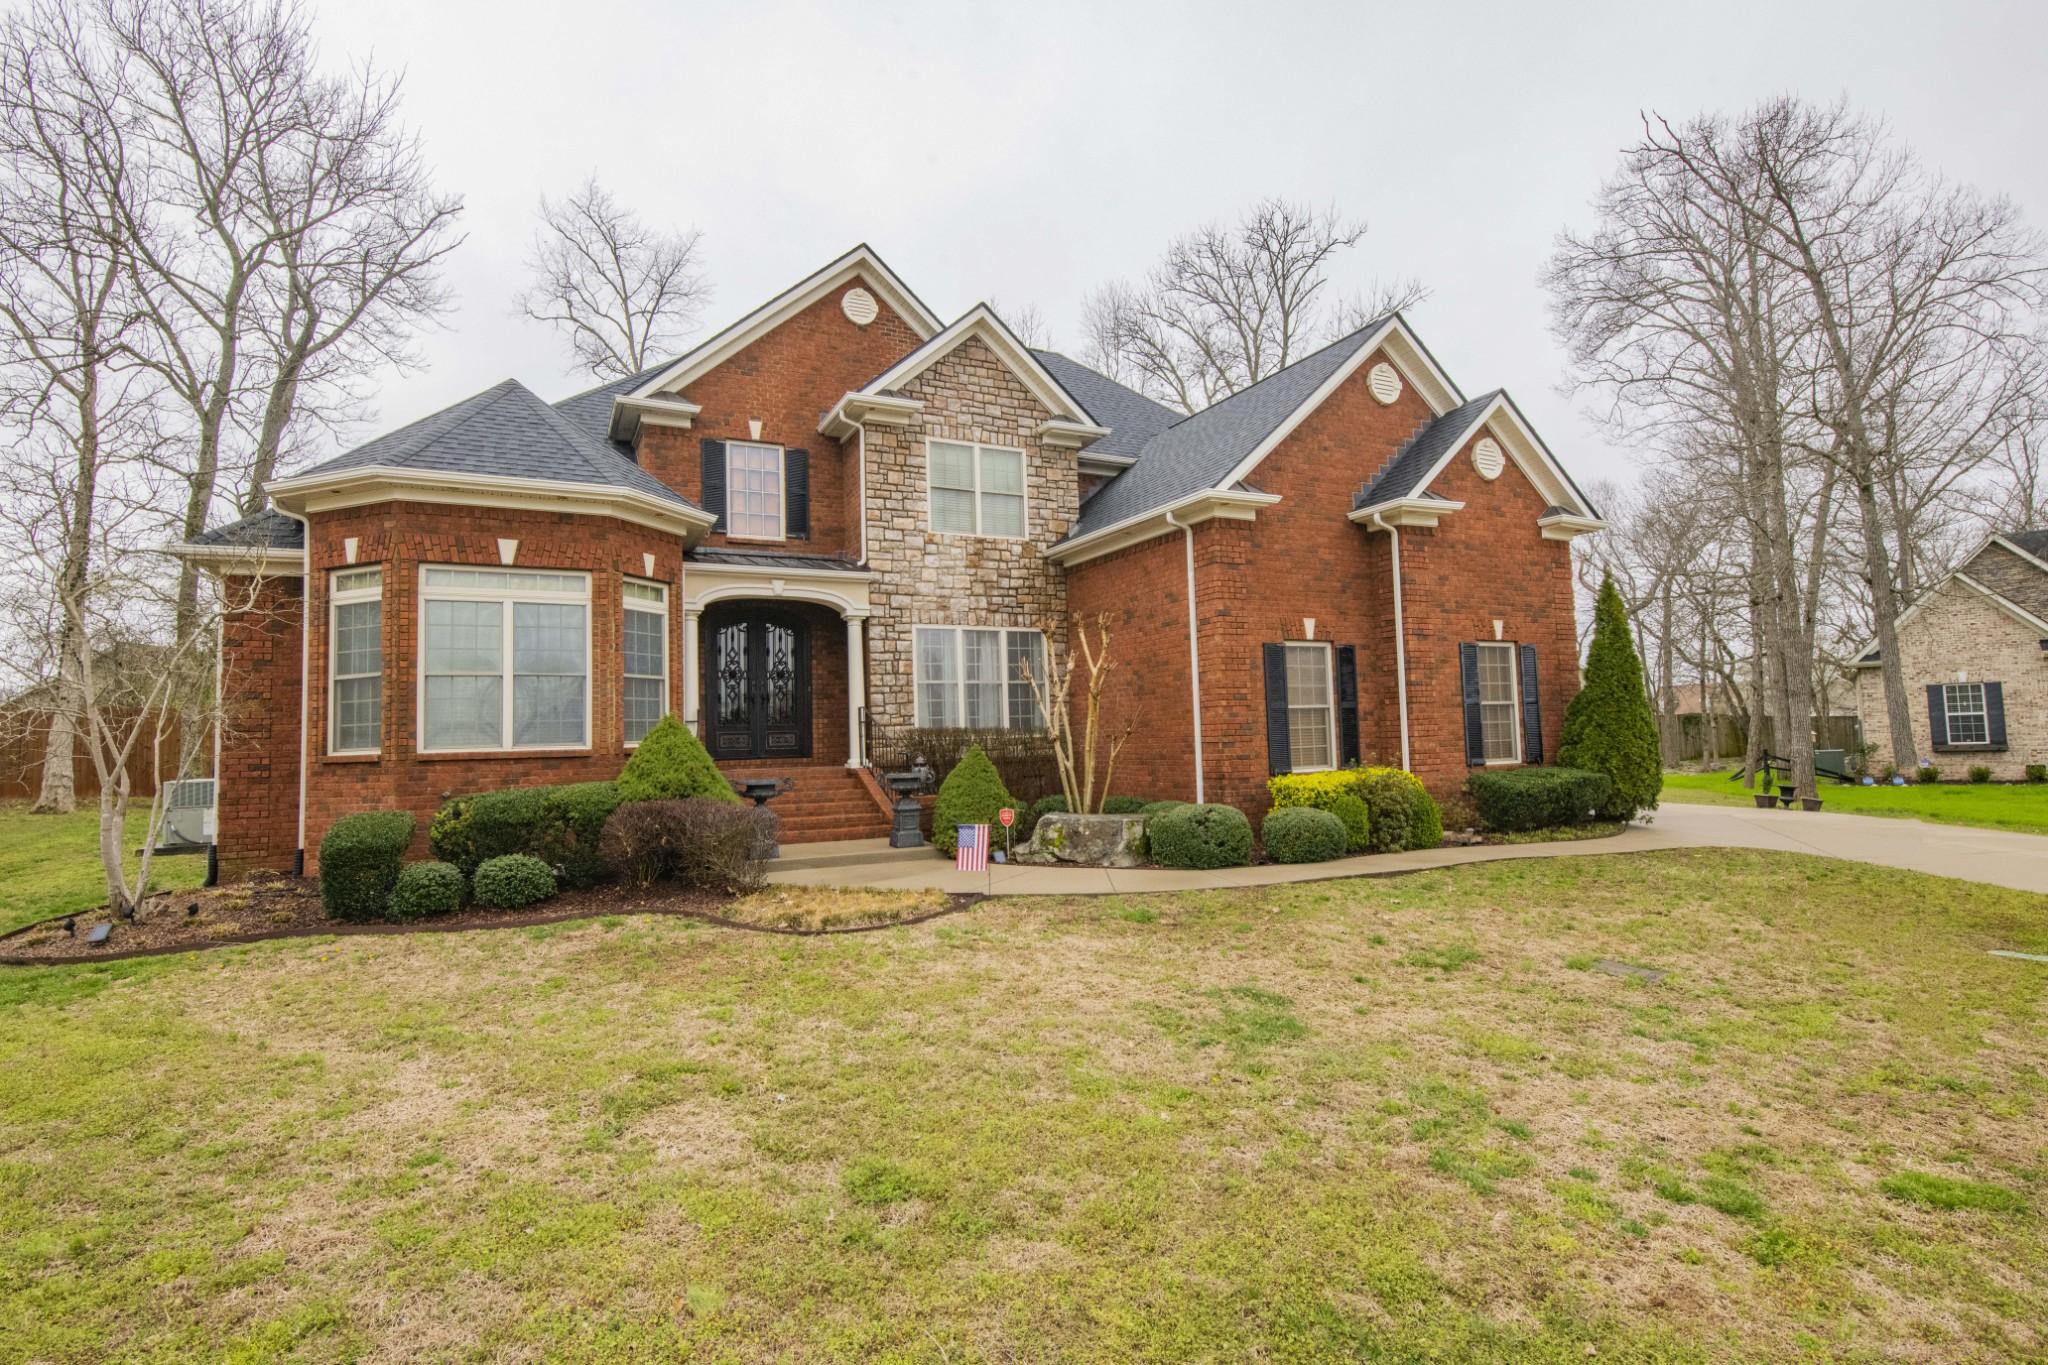 2435 Garrison Cv, Murfreesboro, TN 37130 - Murfreesboro, TN real estate listing